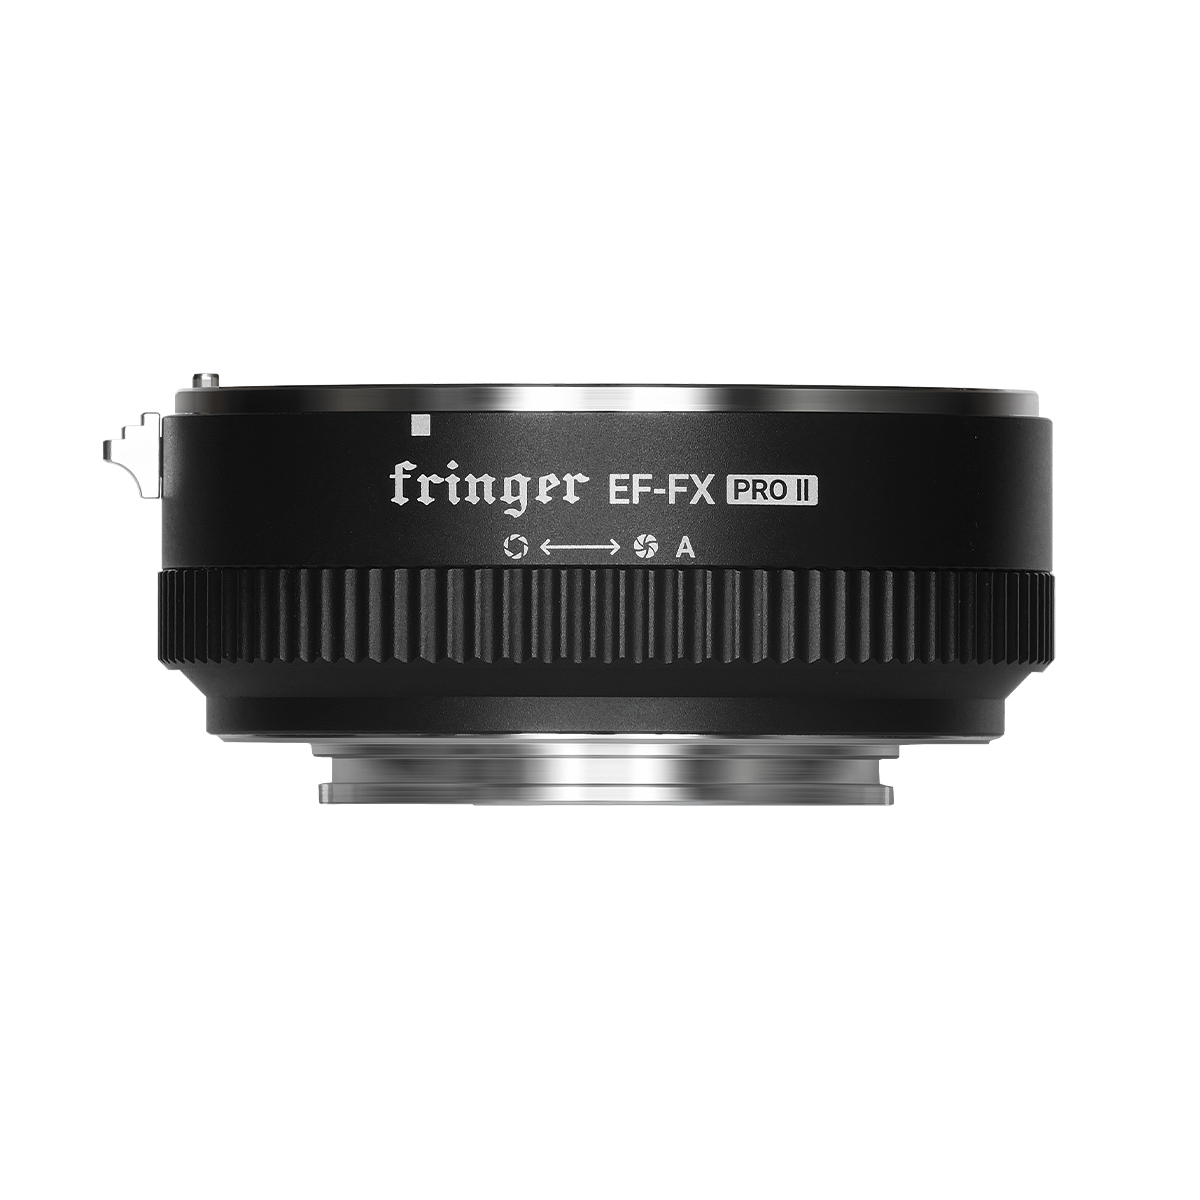 Fringer FR-FX2(キヤノンEFマウントレンズ → フジフイルムXマウント変換)電子マウントアダプター